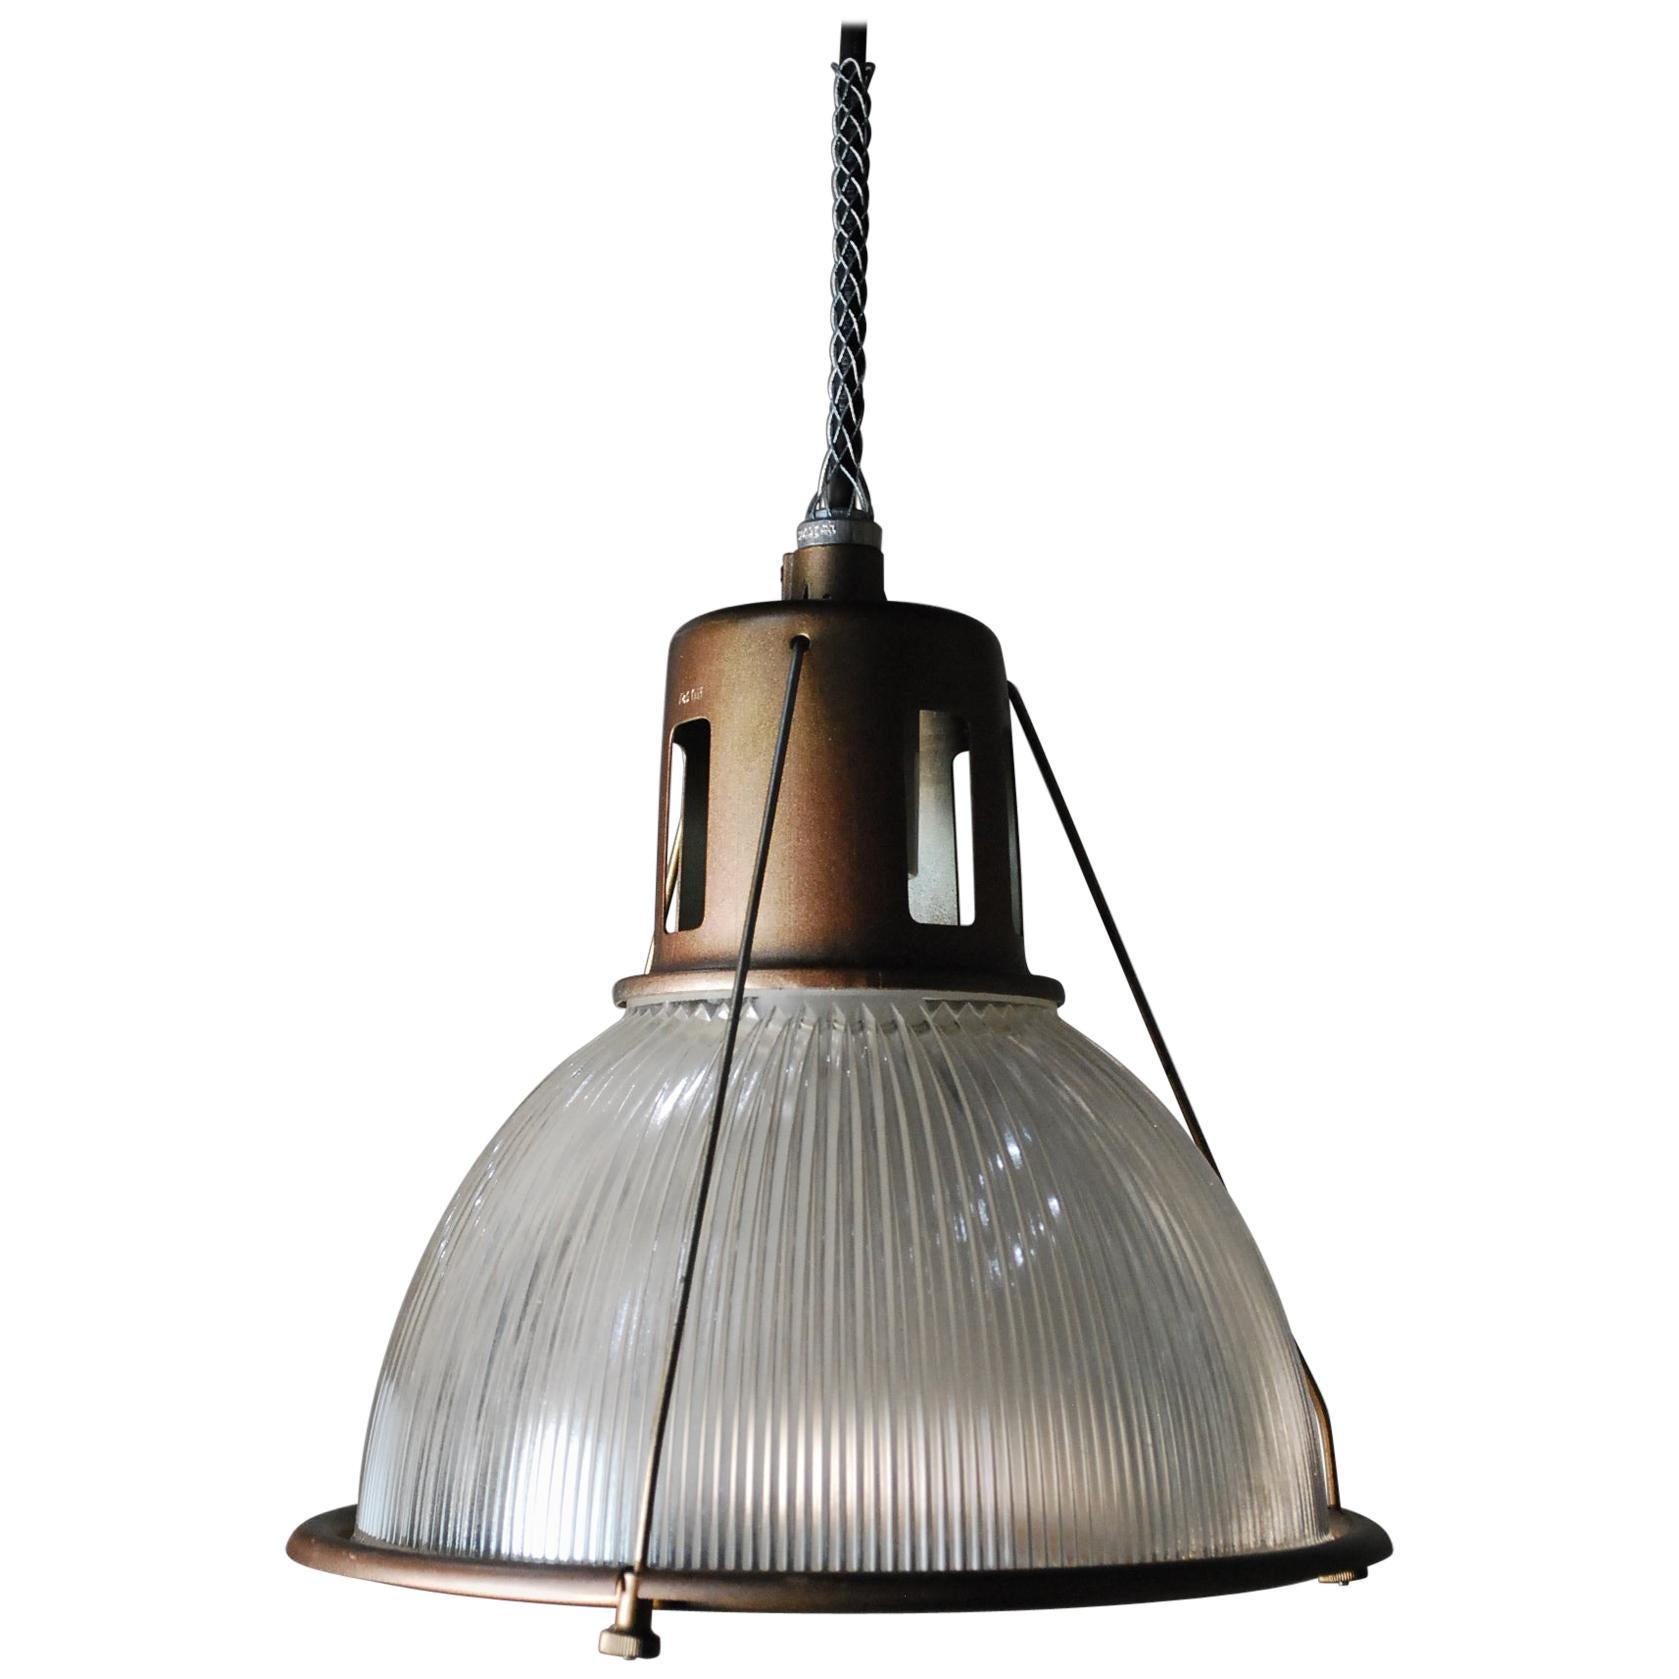 1950 Holophane Industrial Pendants in Bronze Finish